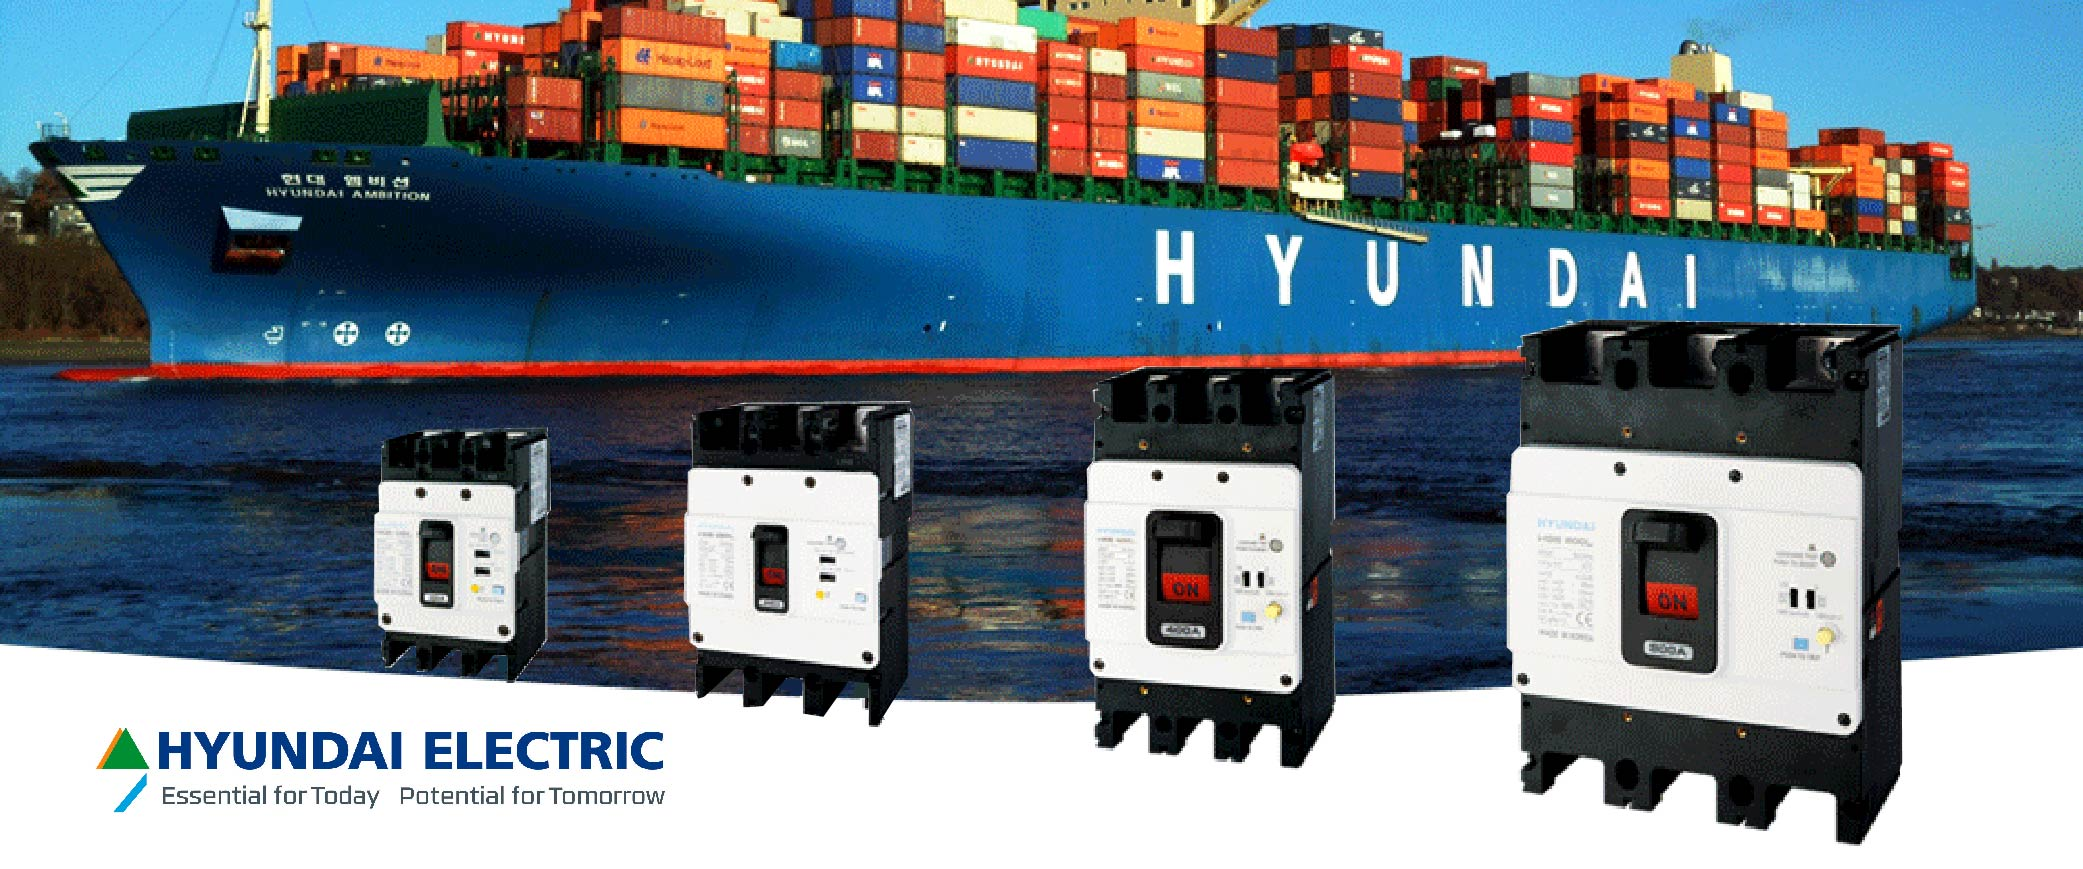 4.Hyundai Electric